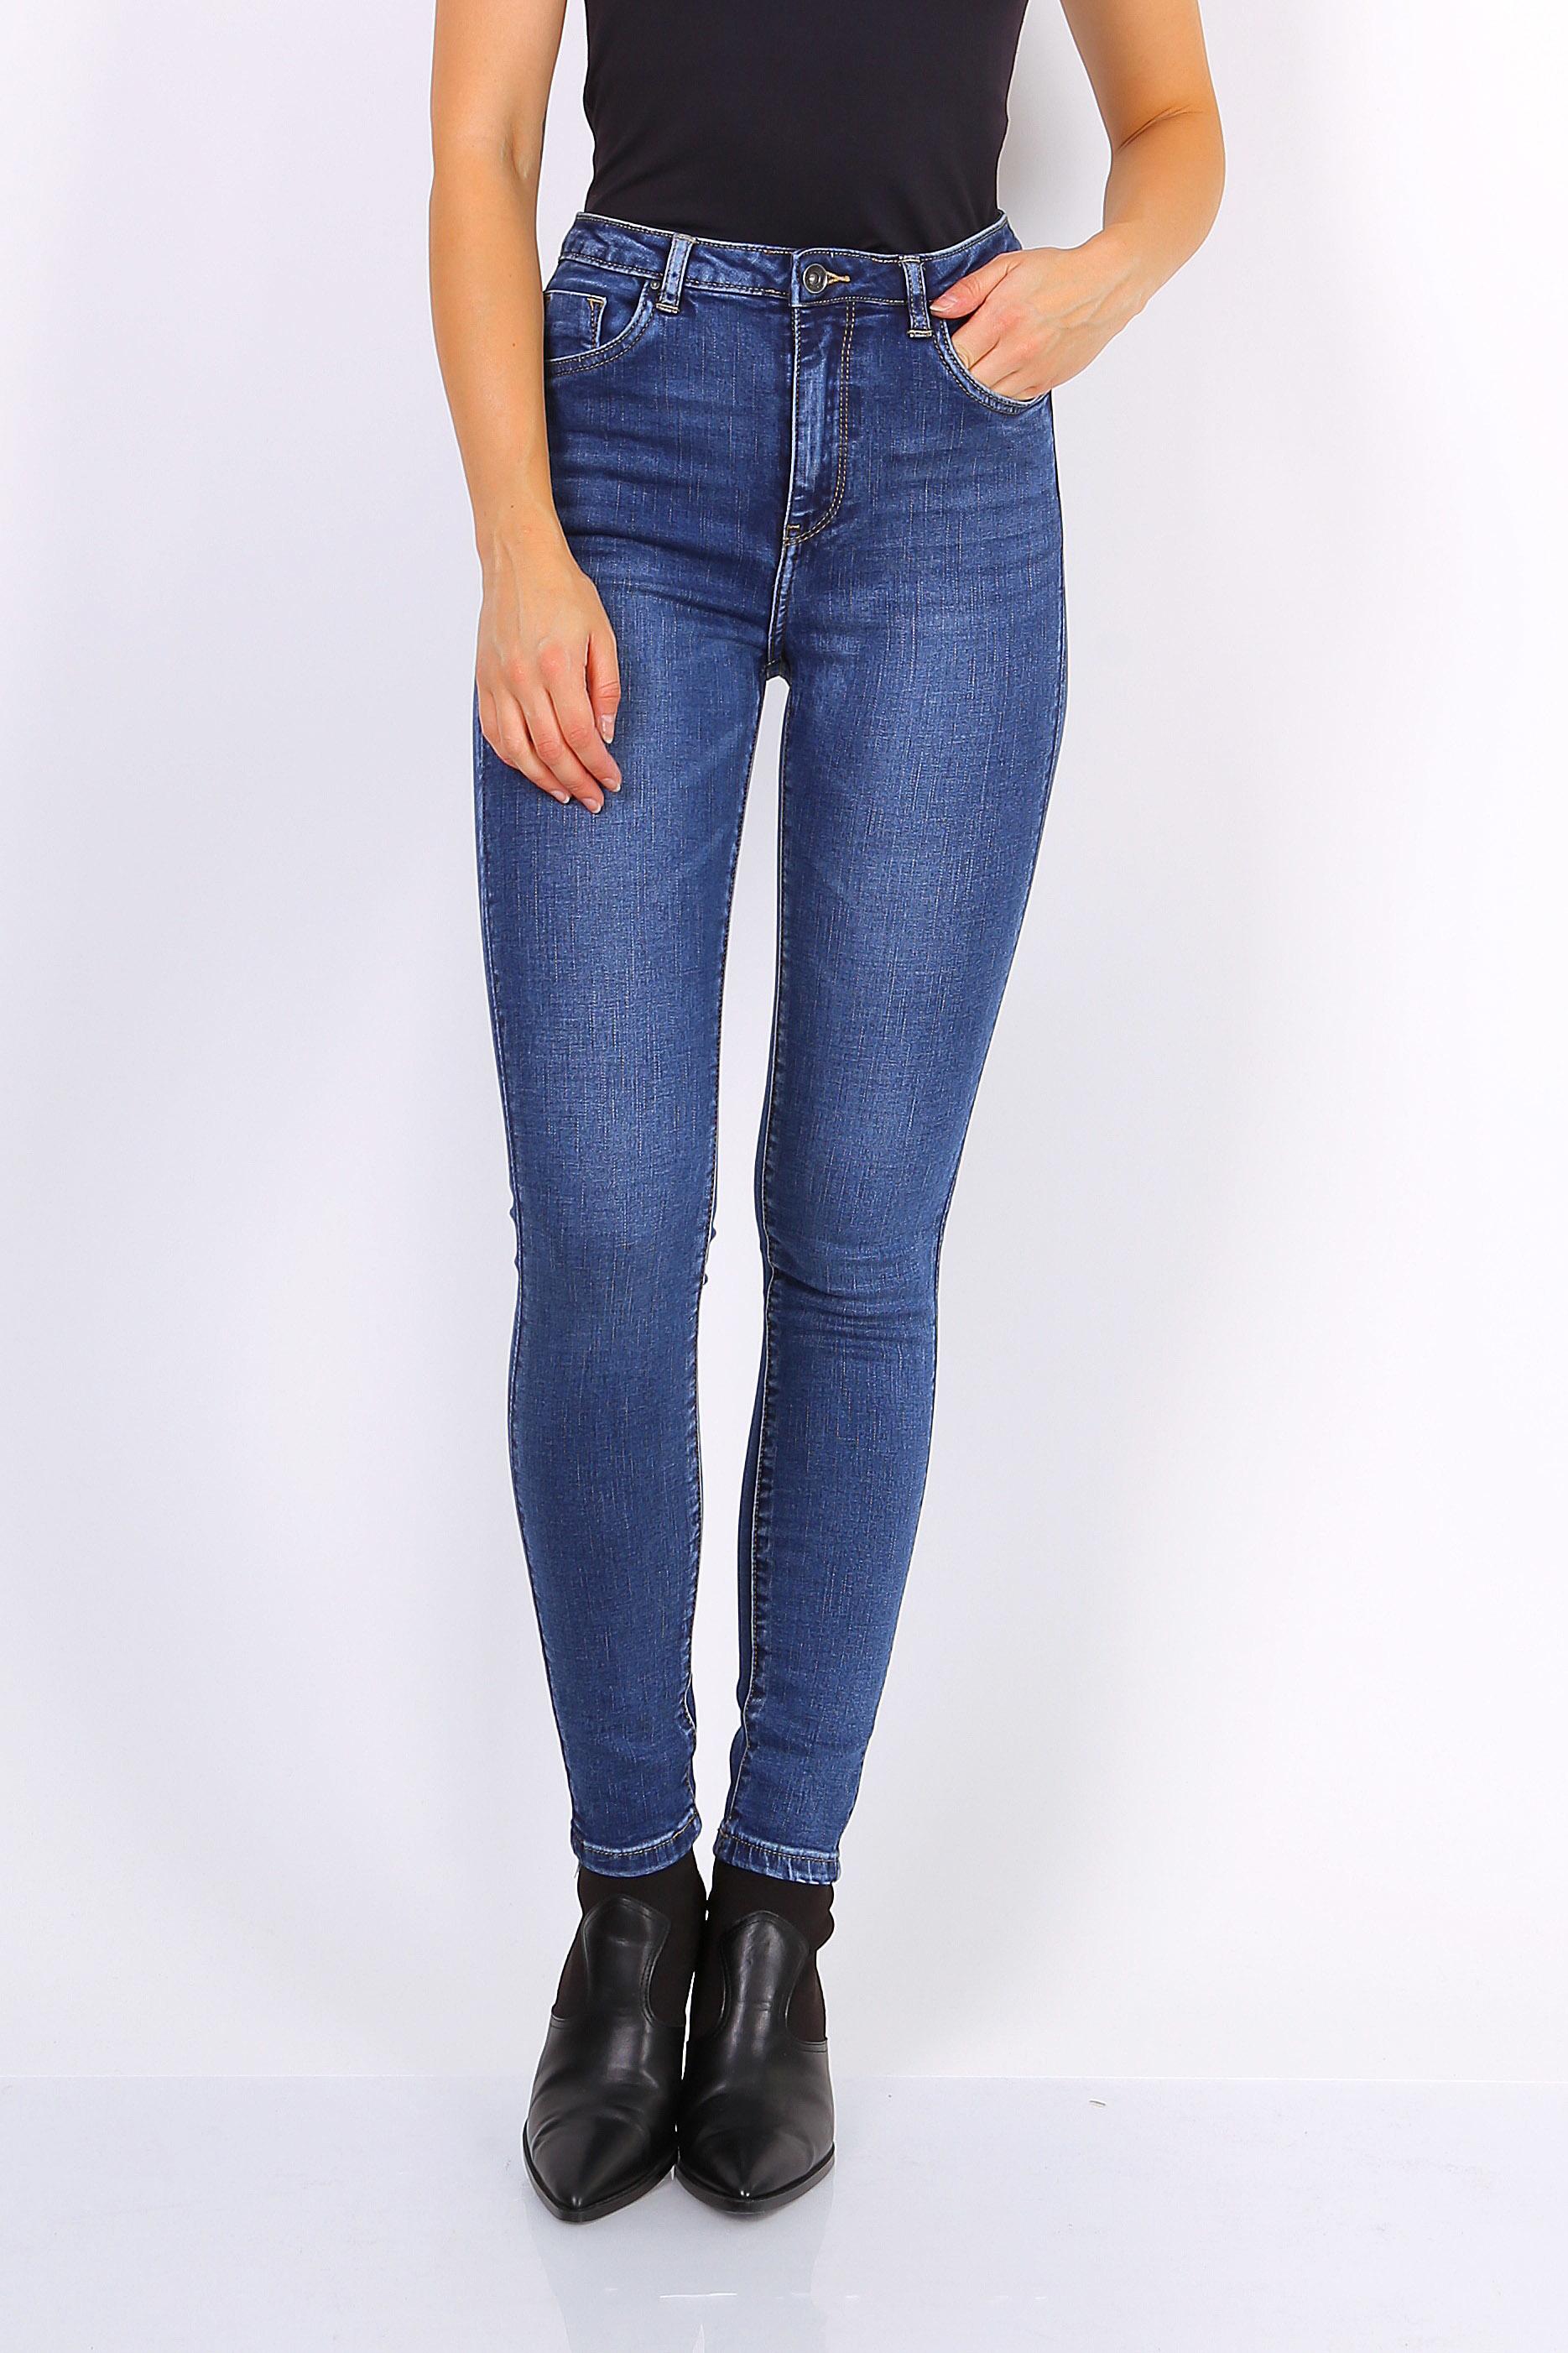 Toxik 3 Jeans | L185-J37 Mid Blue Denim High Waisted Super Stretch